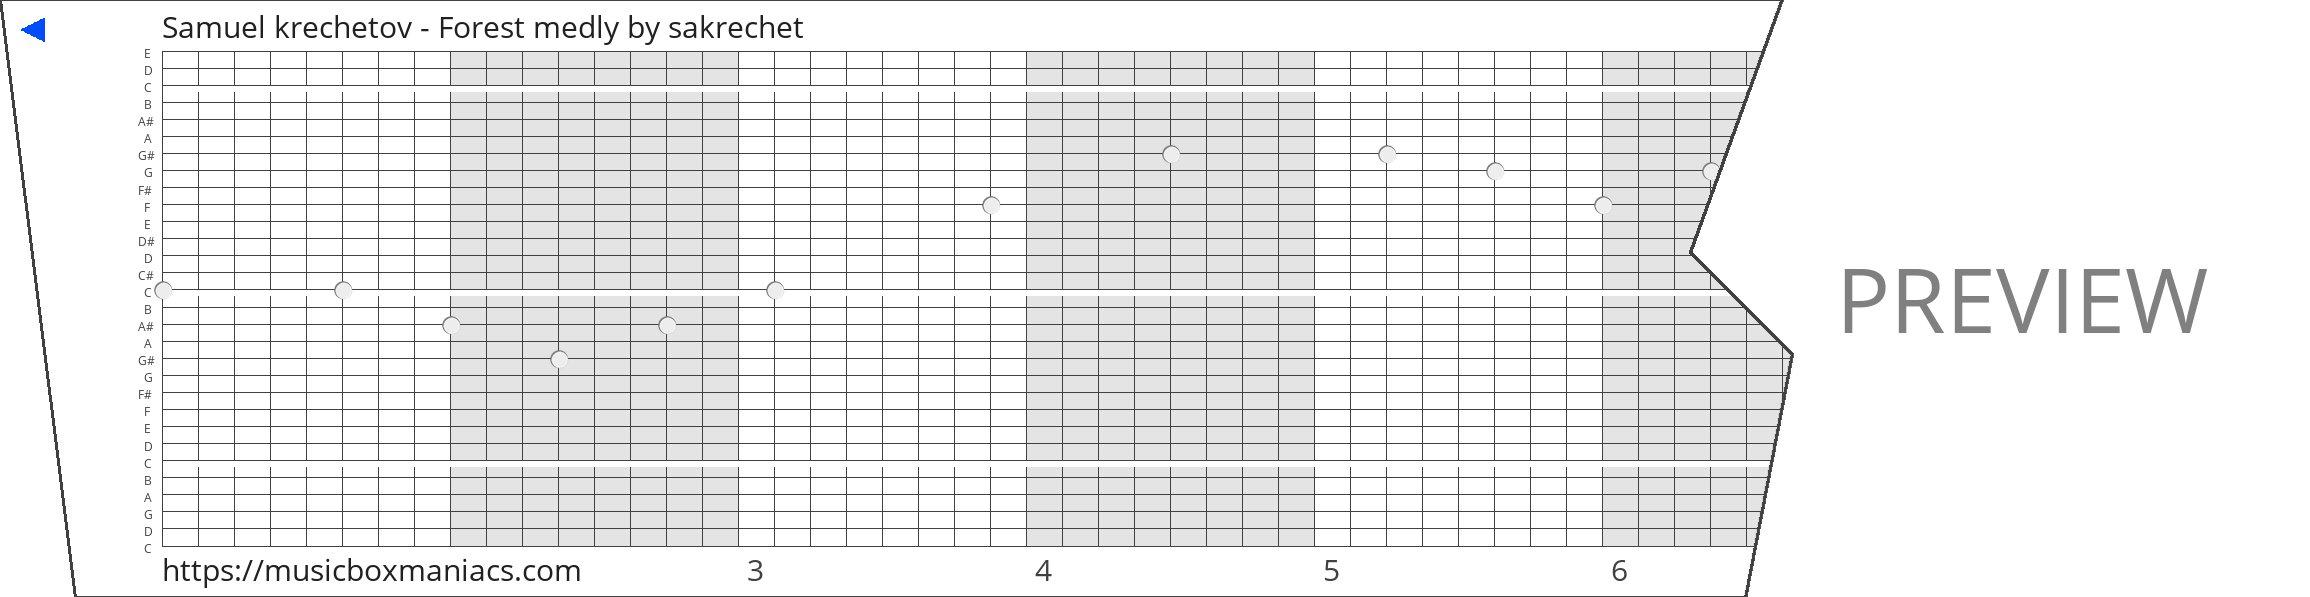 Samuel krechetov - Forest medly 30 note music box paper strip